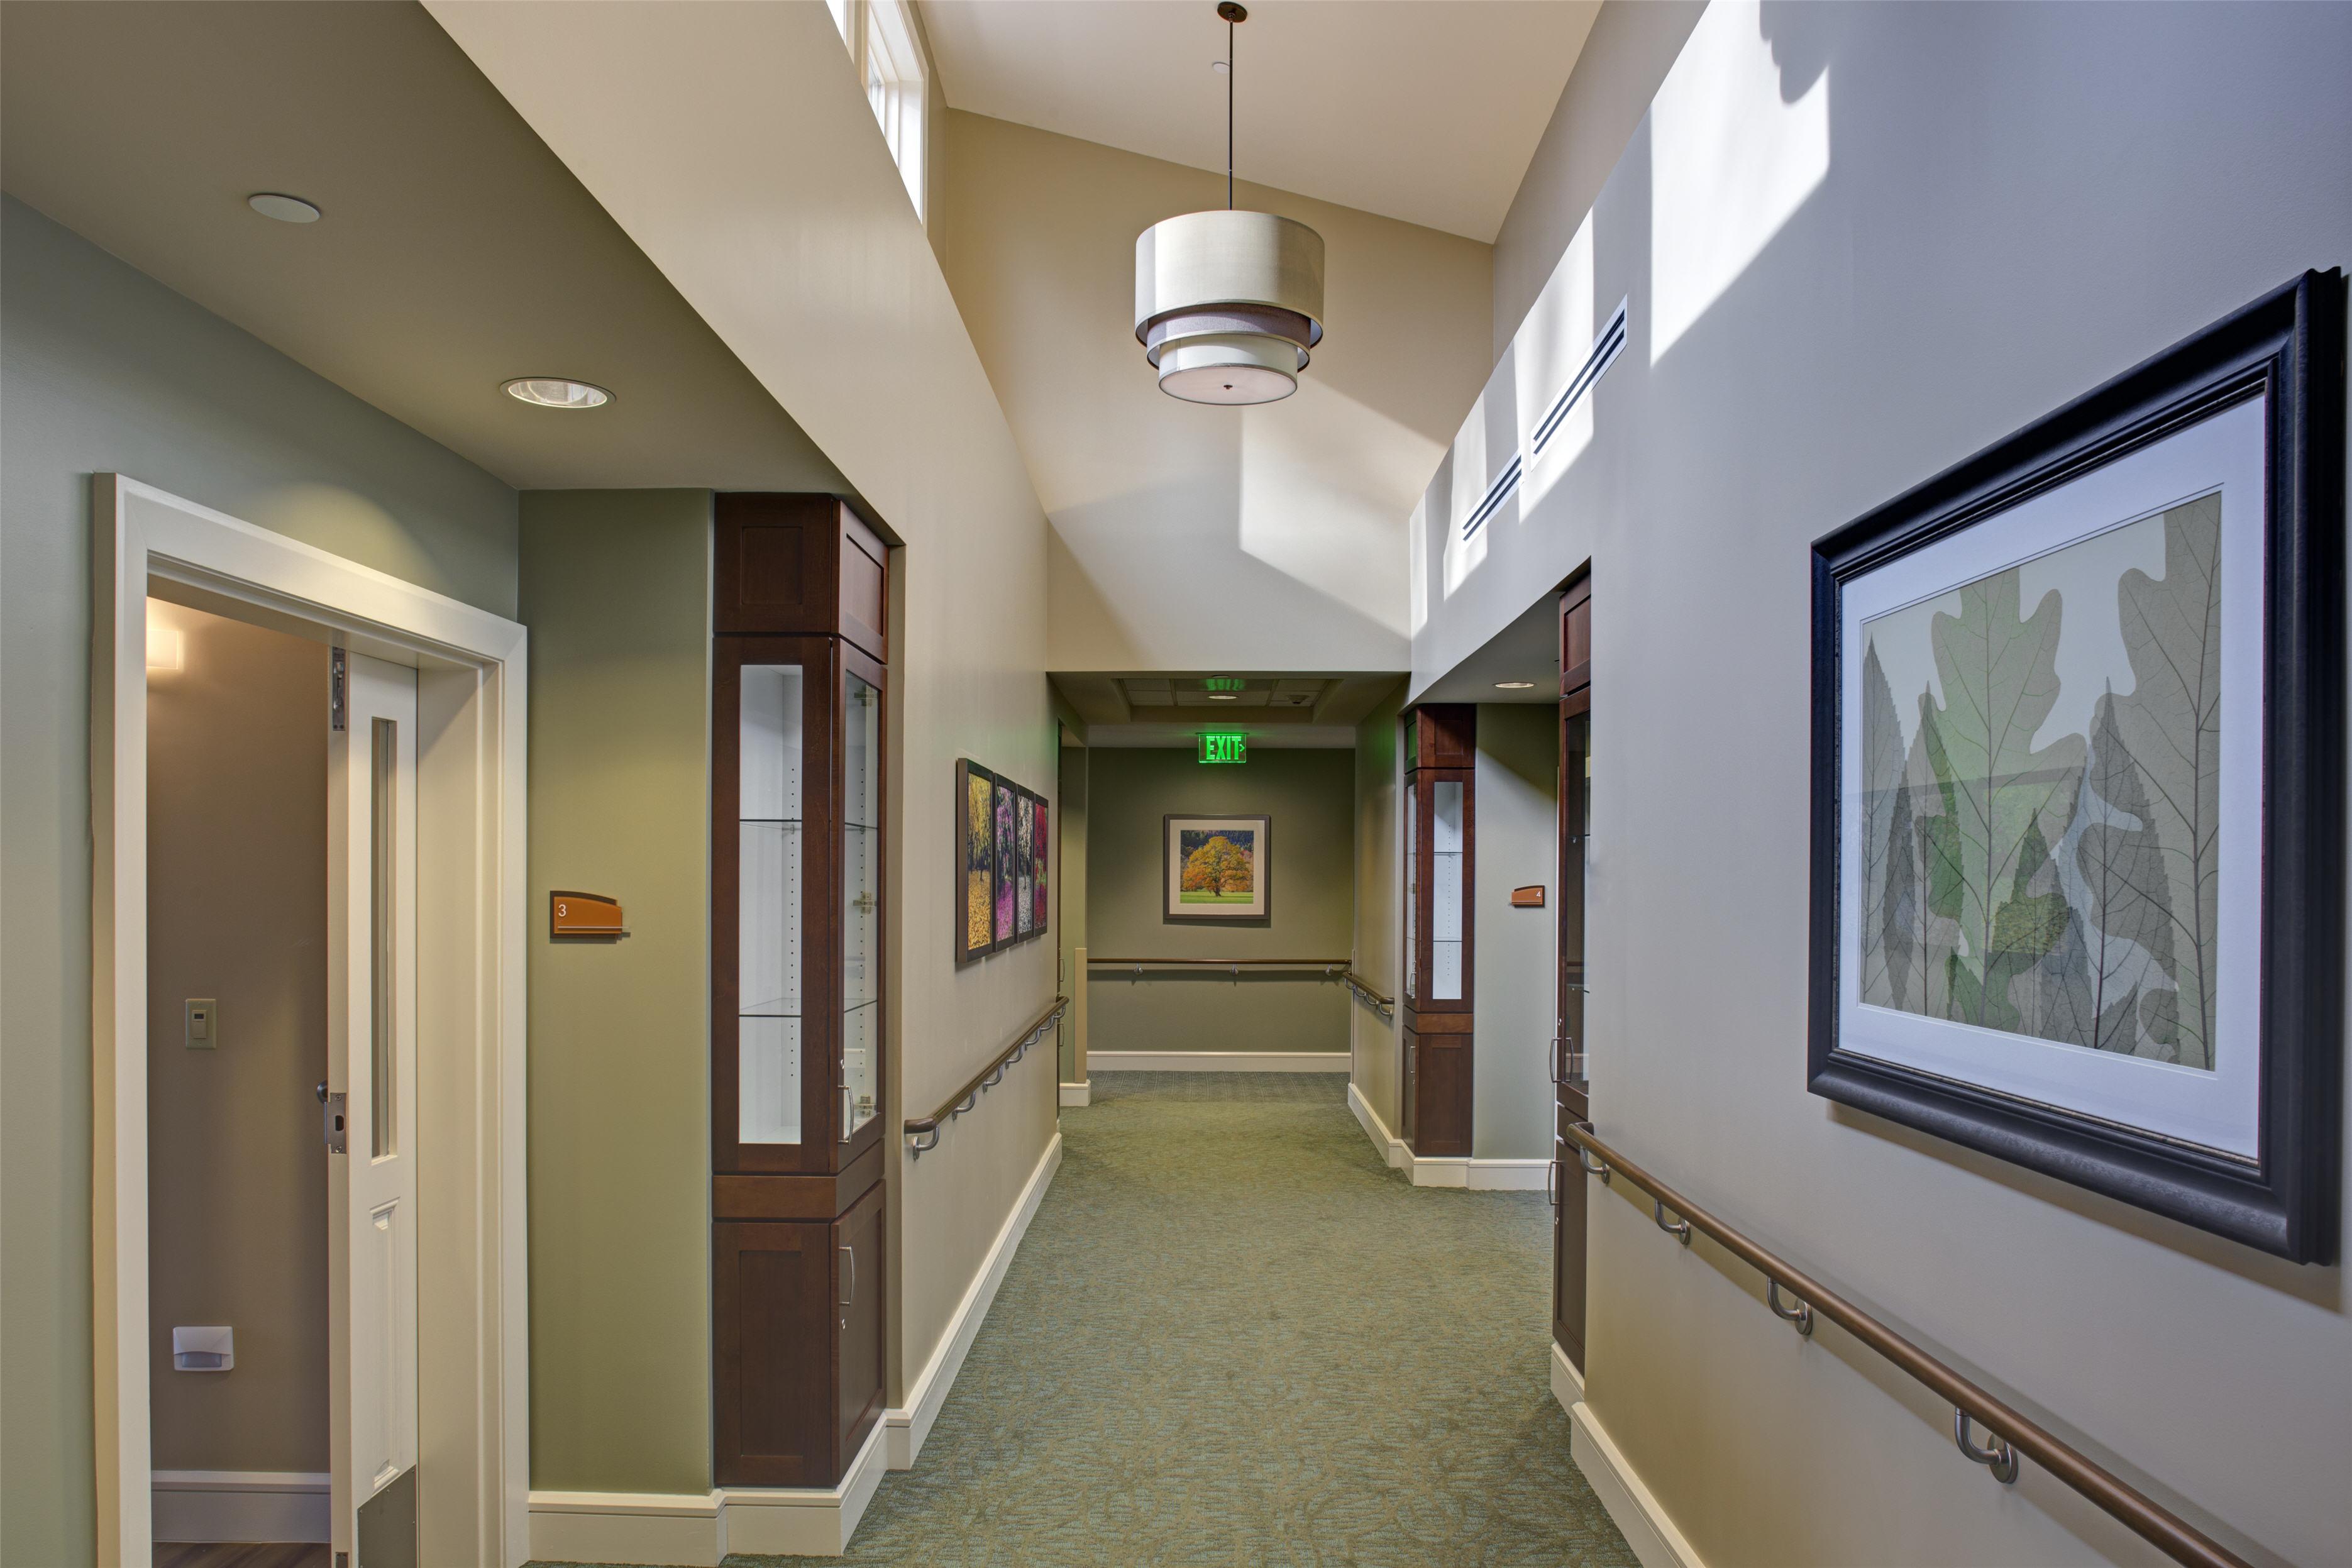 82 interior design lighting articles take a look to for Nursing home interior design ideas